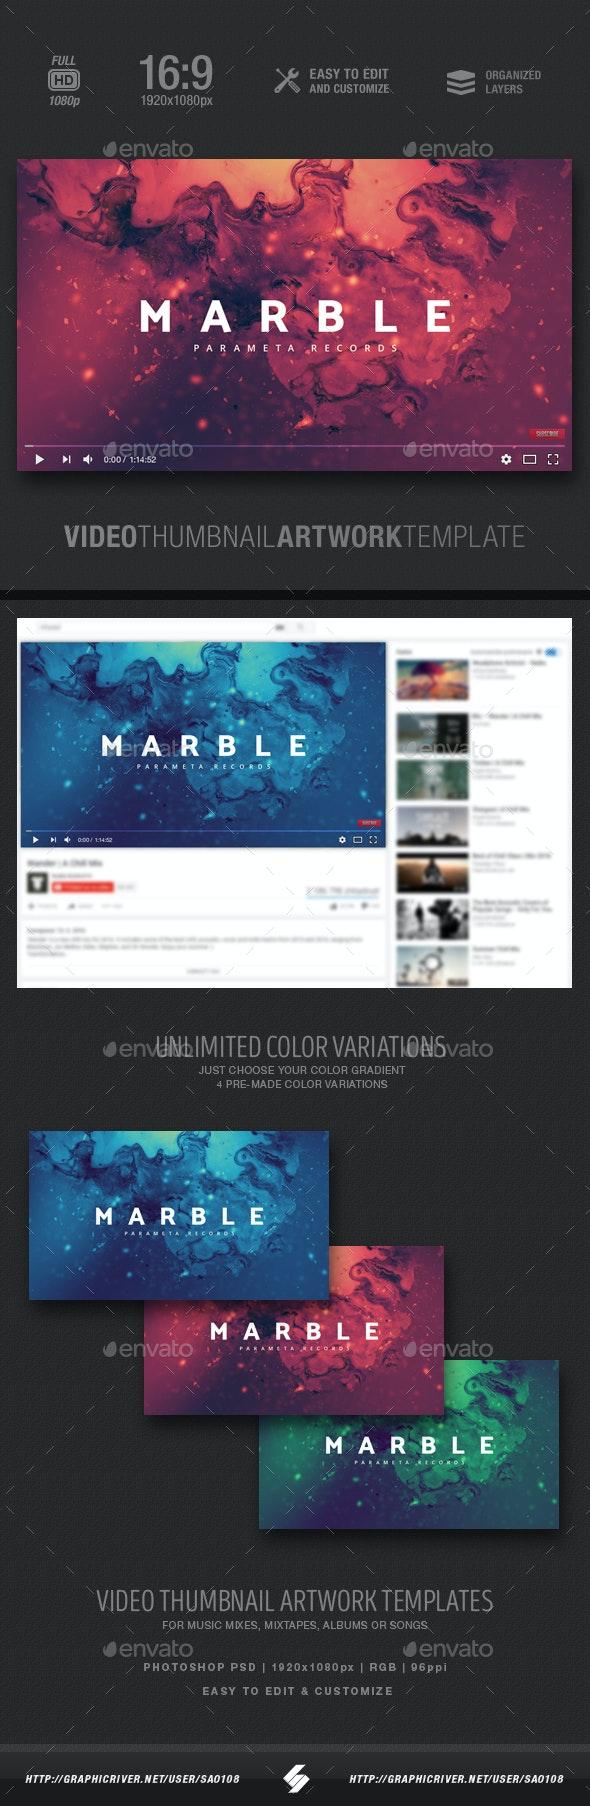 Marble - Music Video Thumbnail Artwork - YouTube Social Media